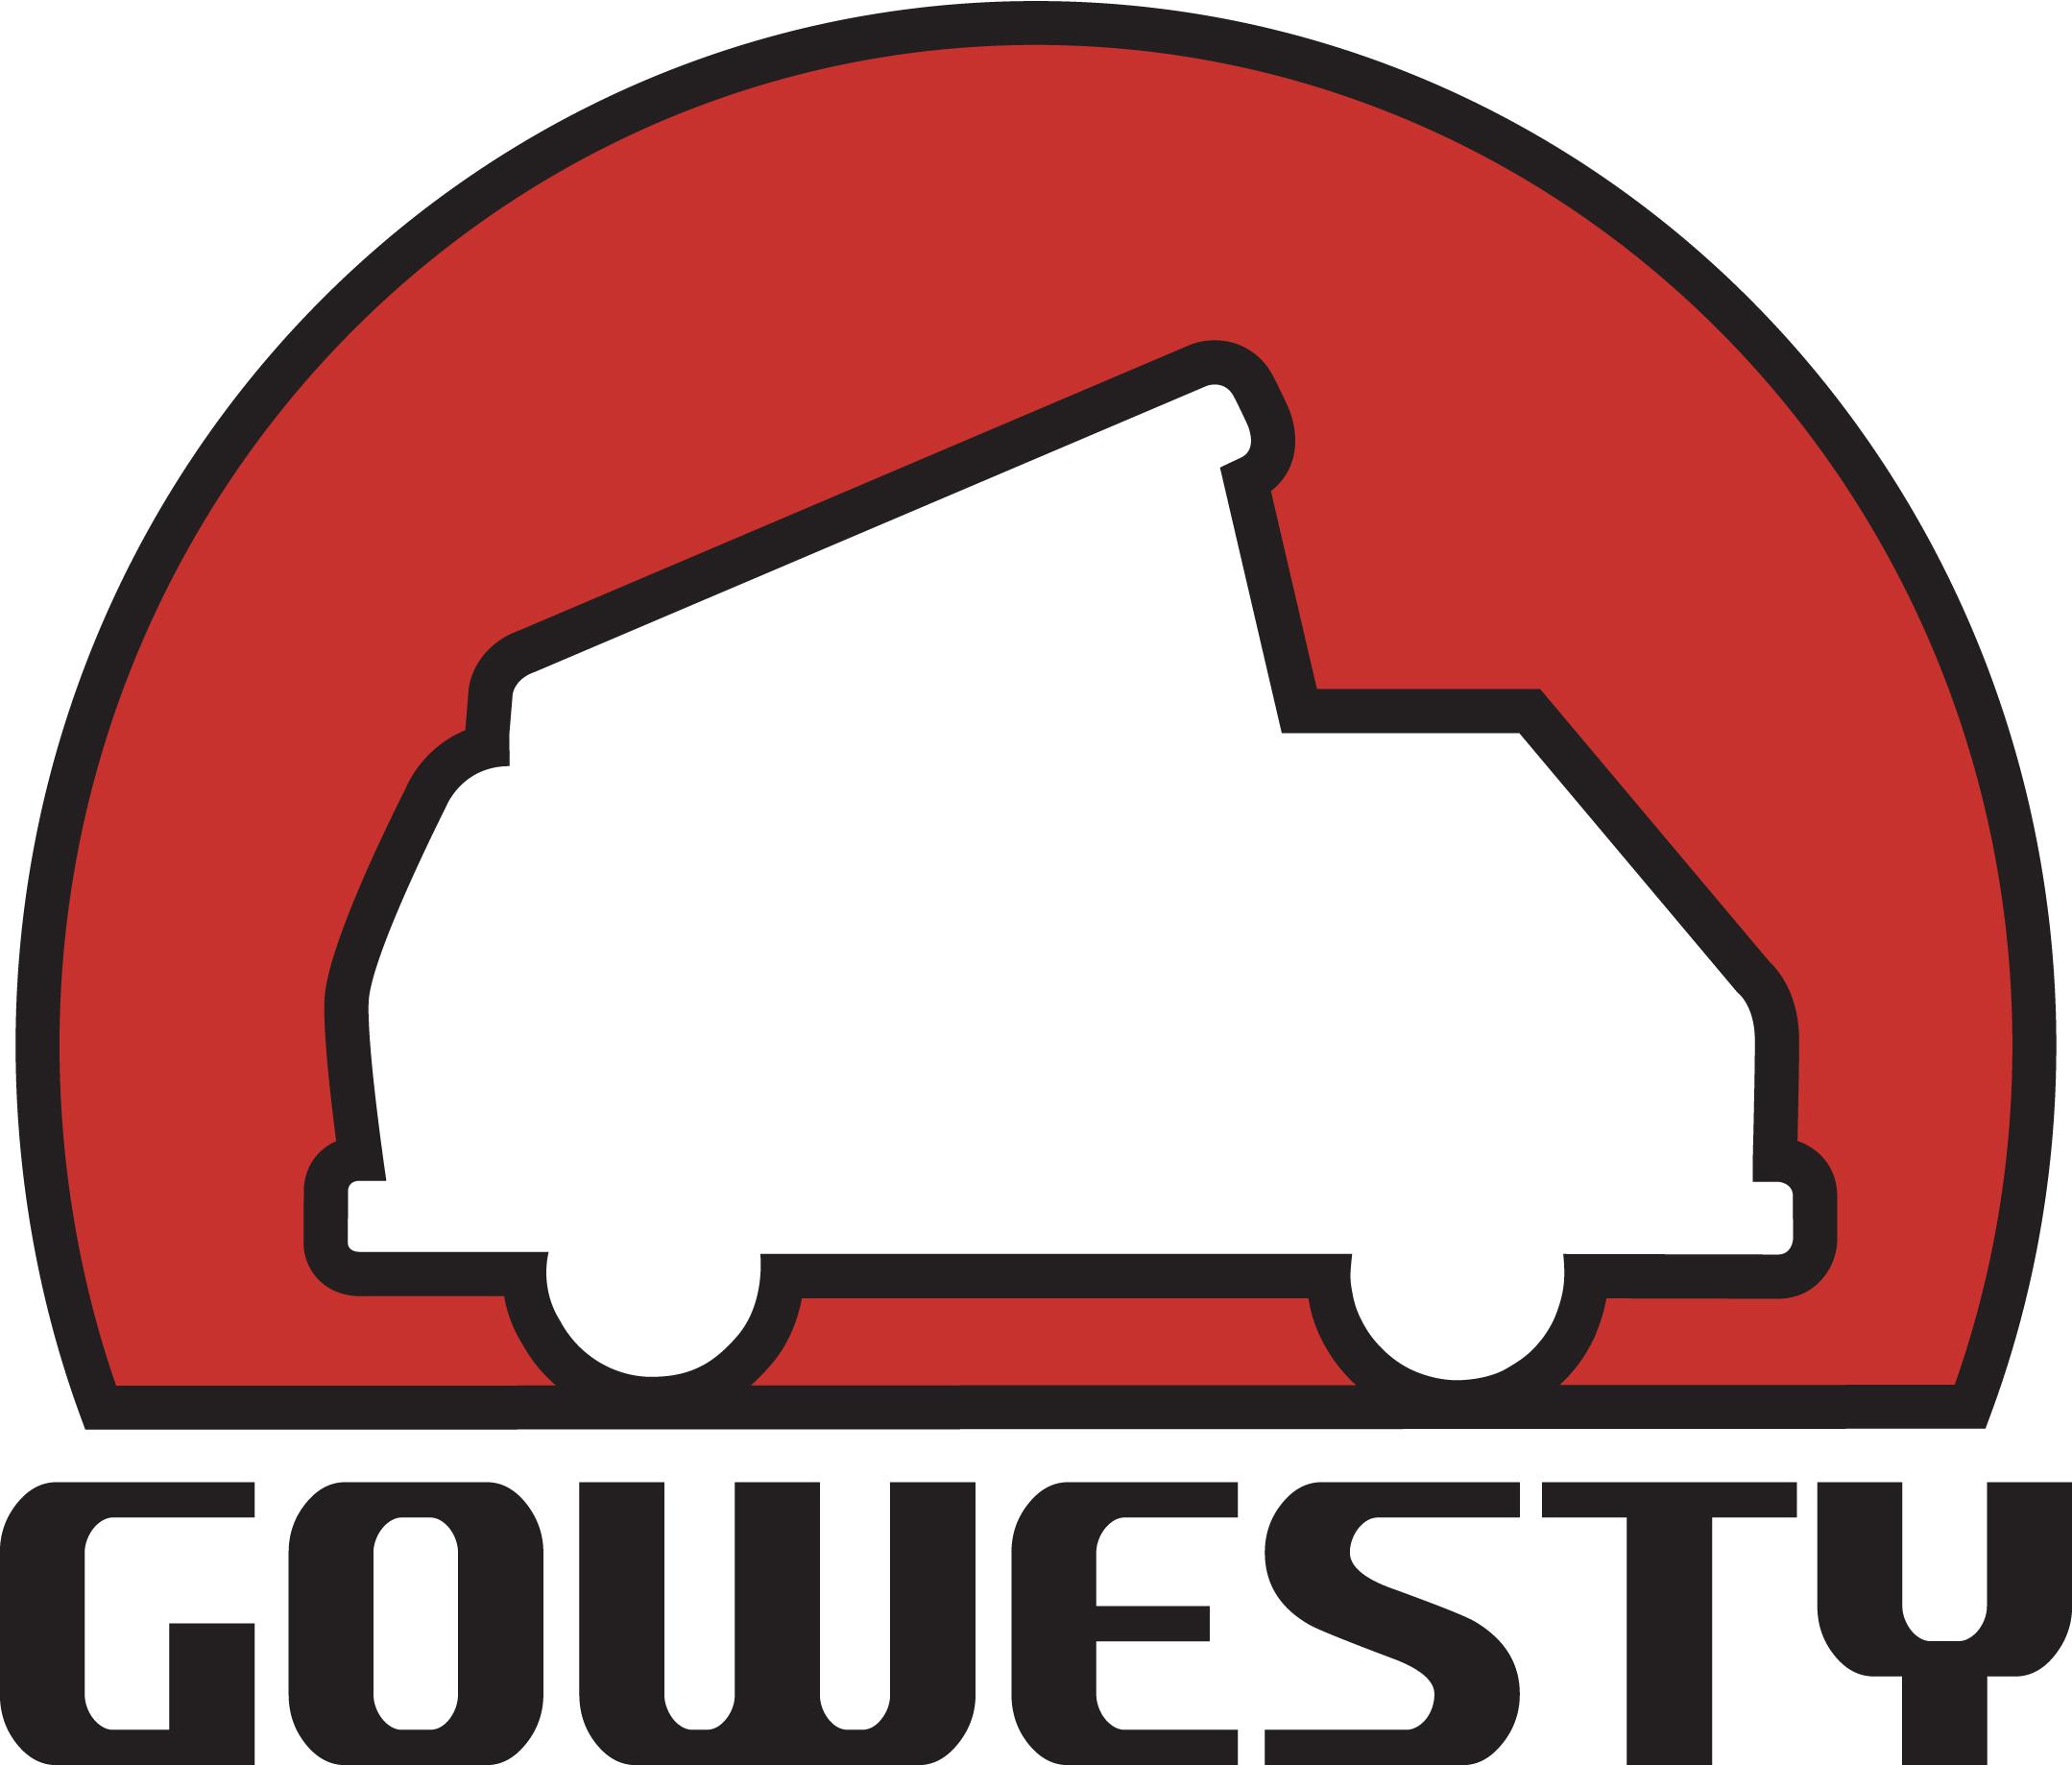 gowesty_logo_original.jpg